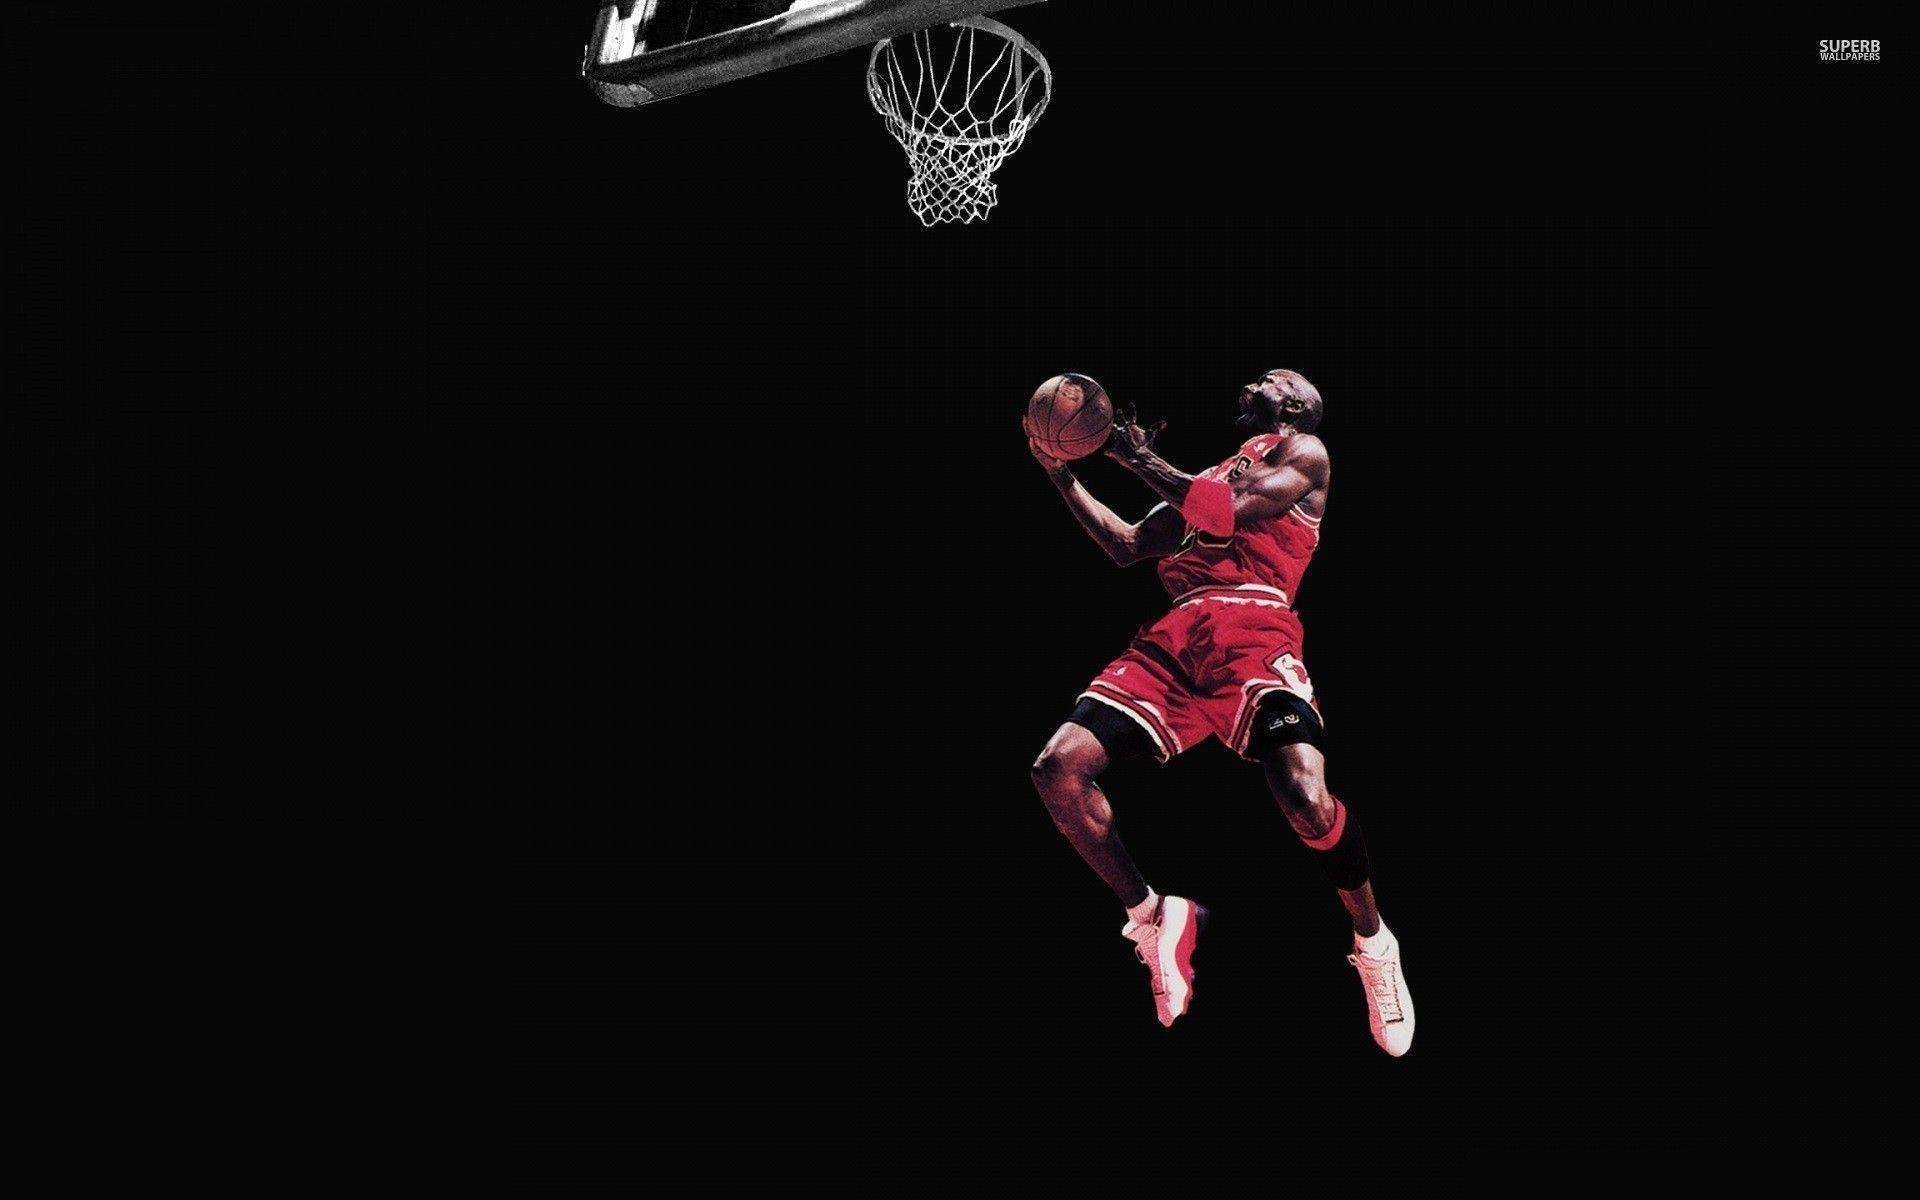 Michael Jordan Dunk Wallpapers 1920x1200